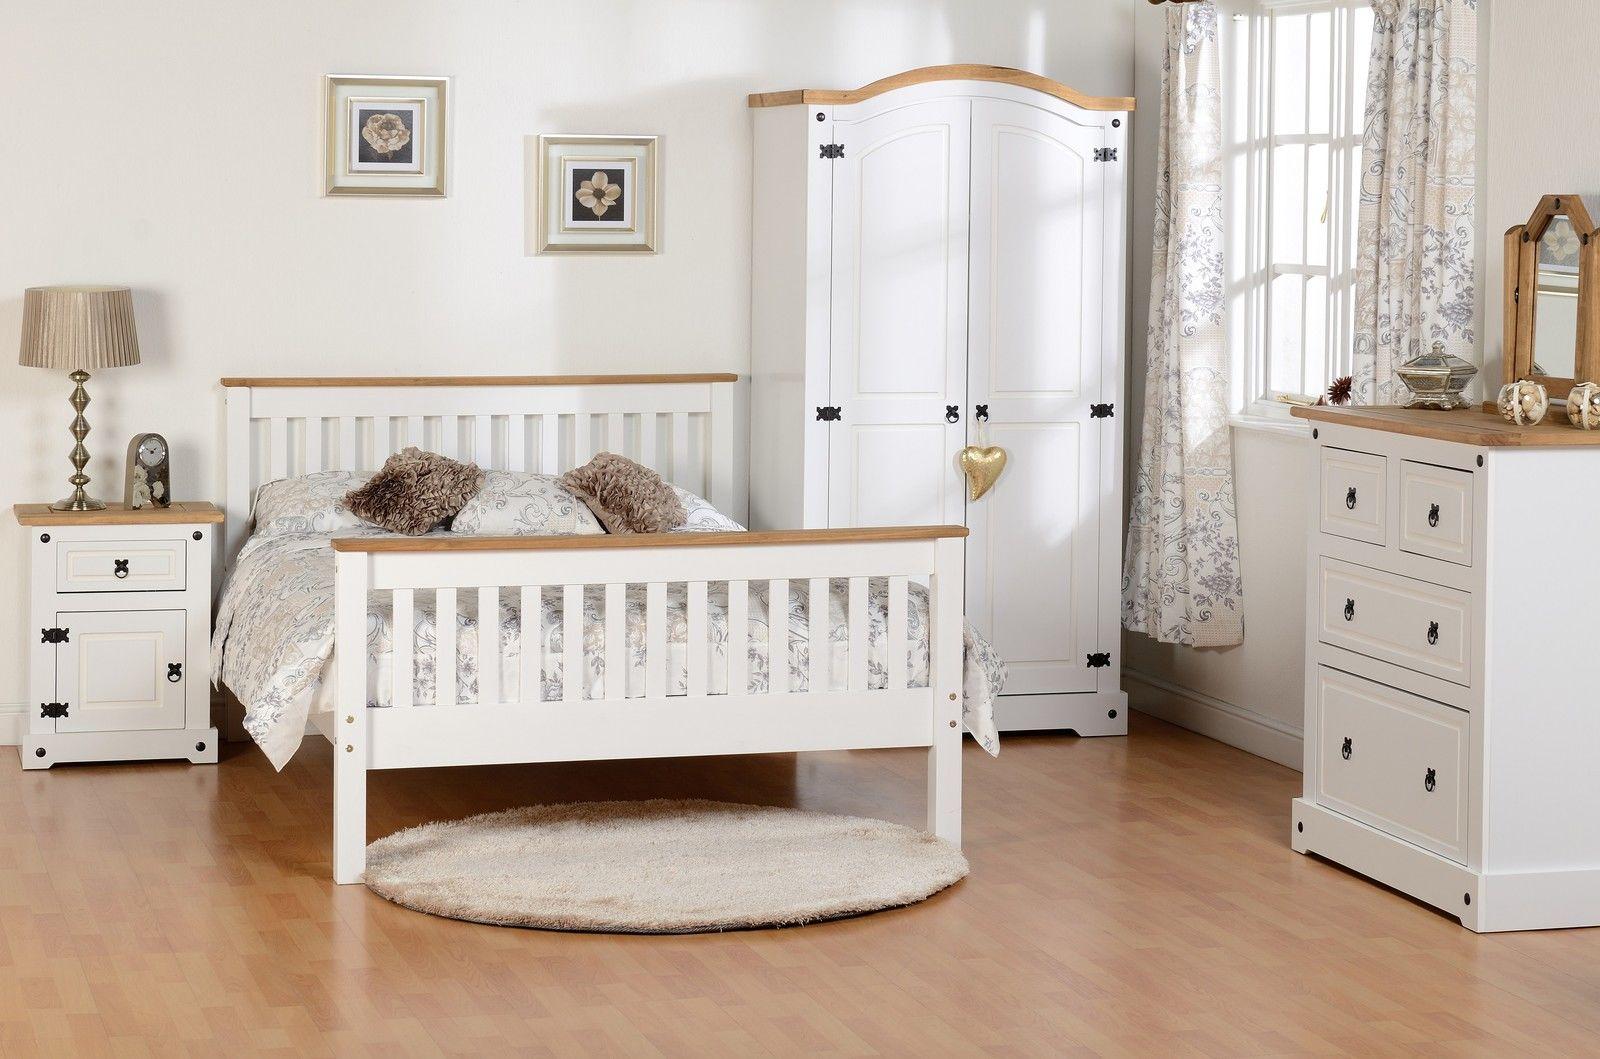 Seconique White Corona Farm House Bedroom Furniture White Waxed